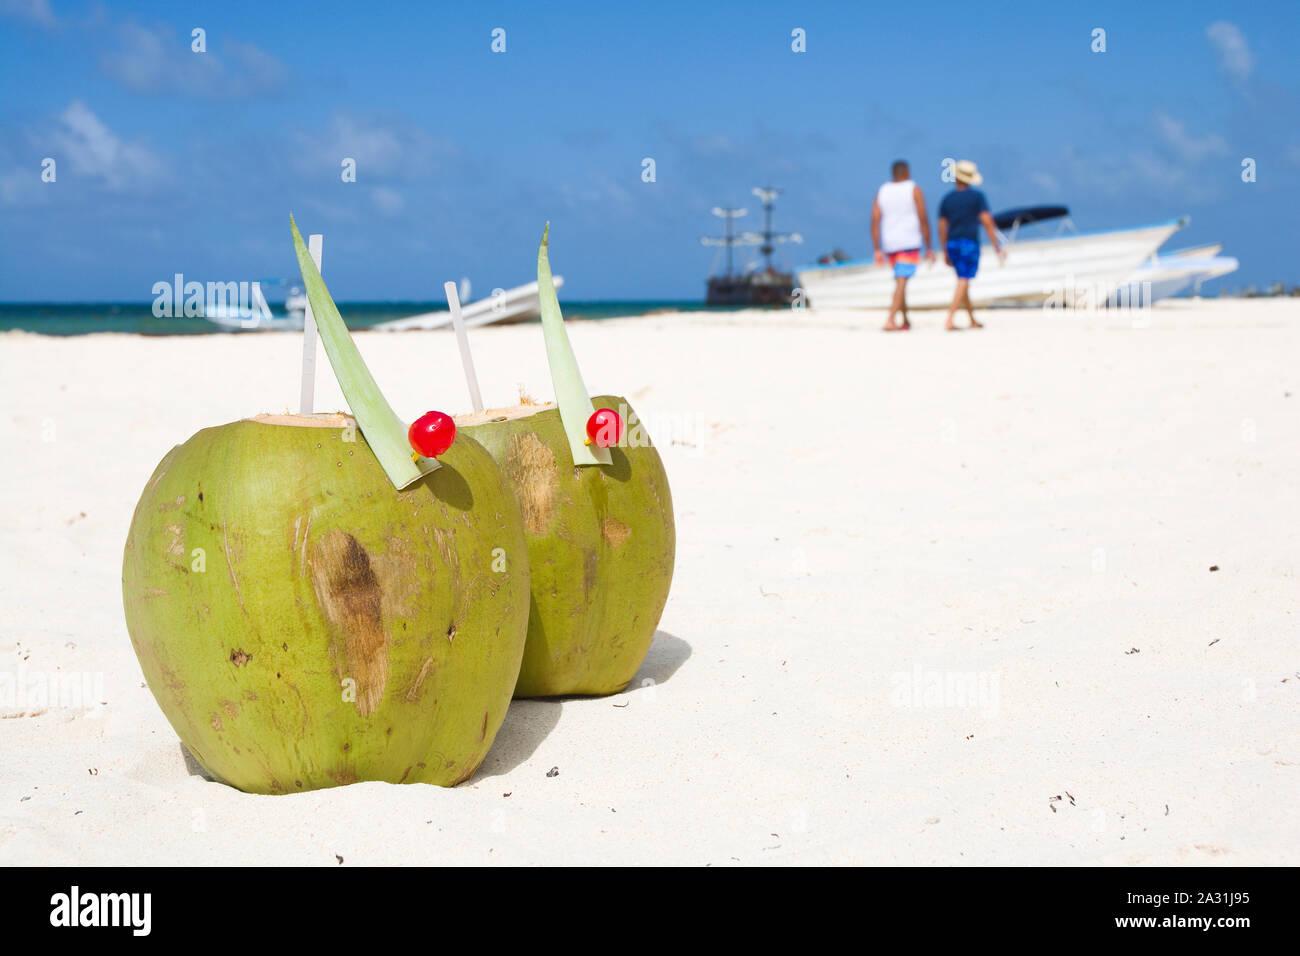 Dating online Daytona spiaggia